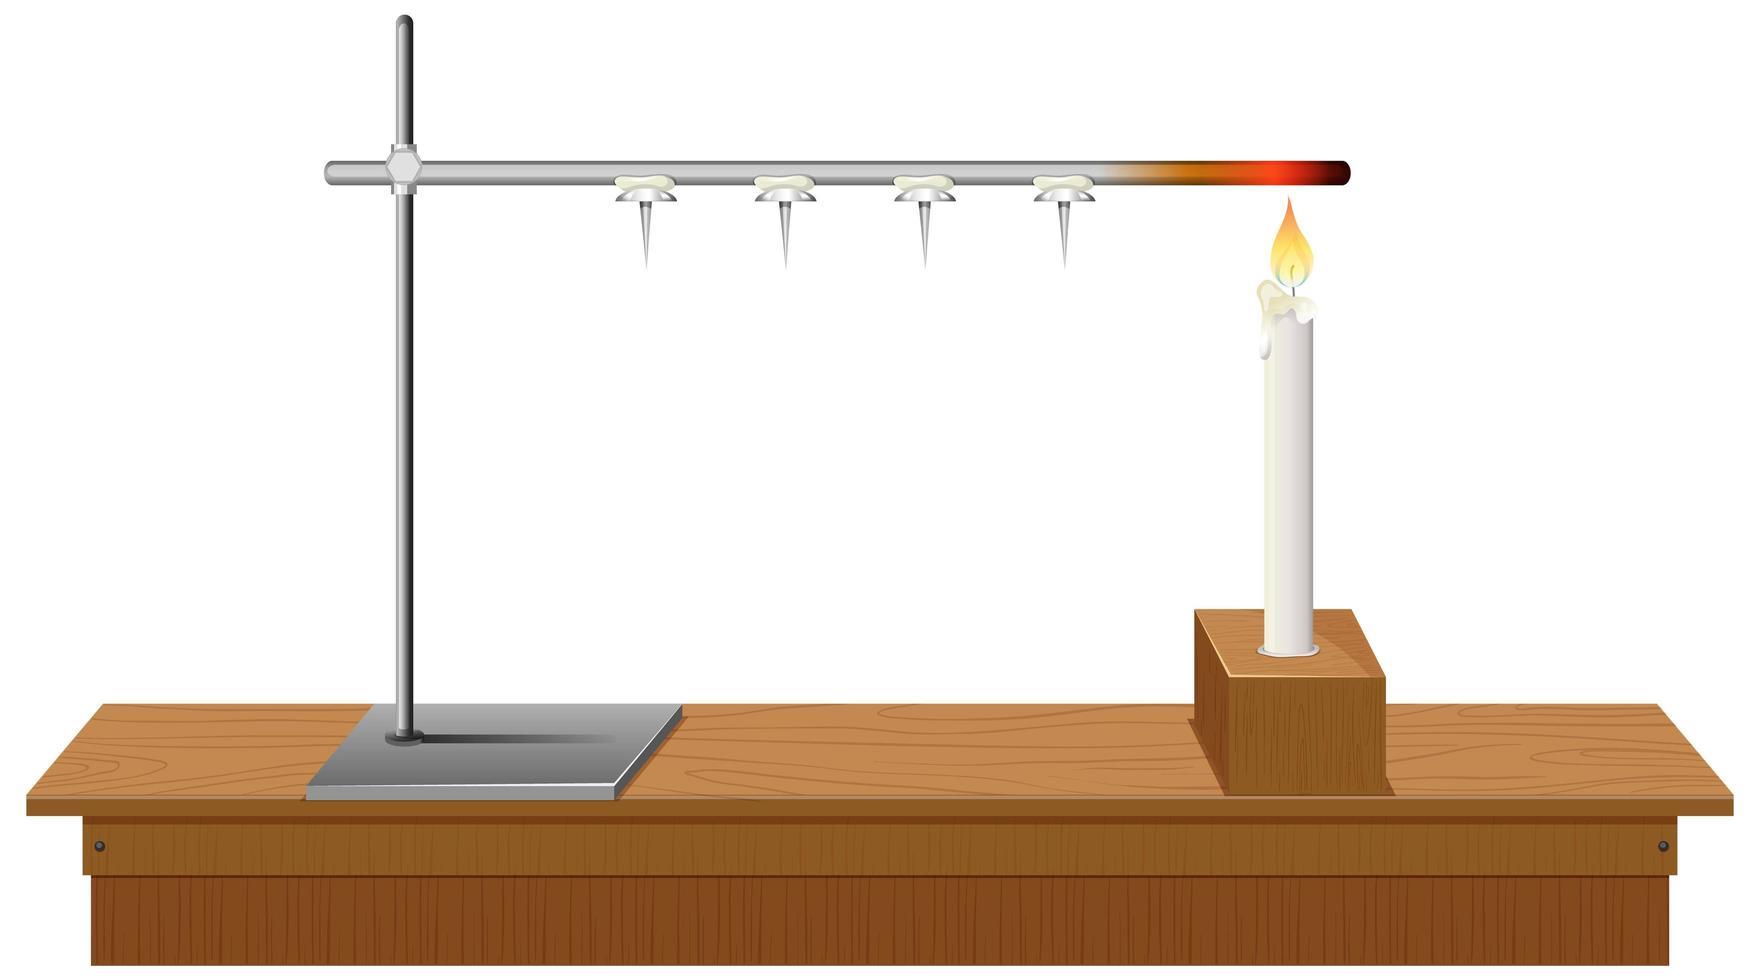 laboratoriestativ på skrivbordet vit bakgrund vektor